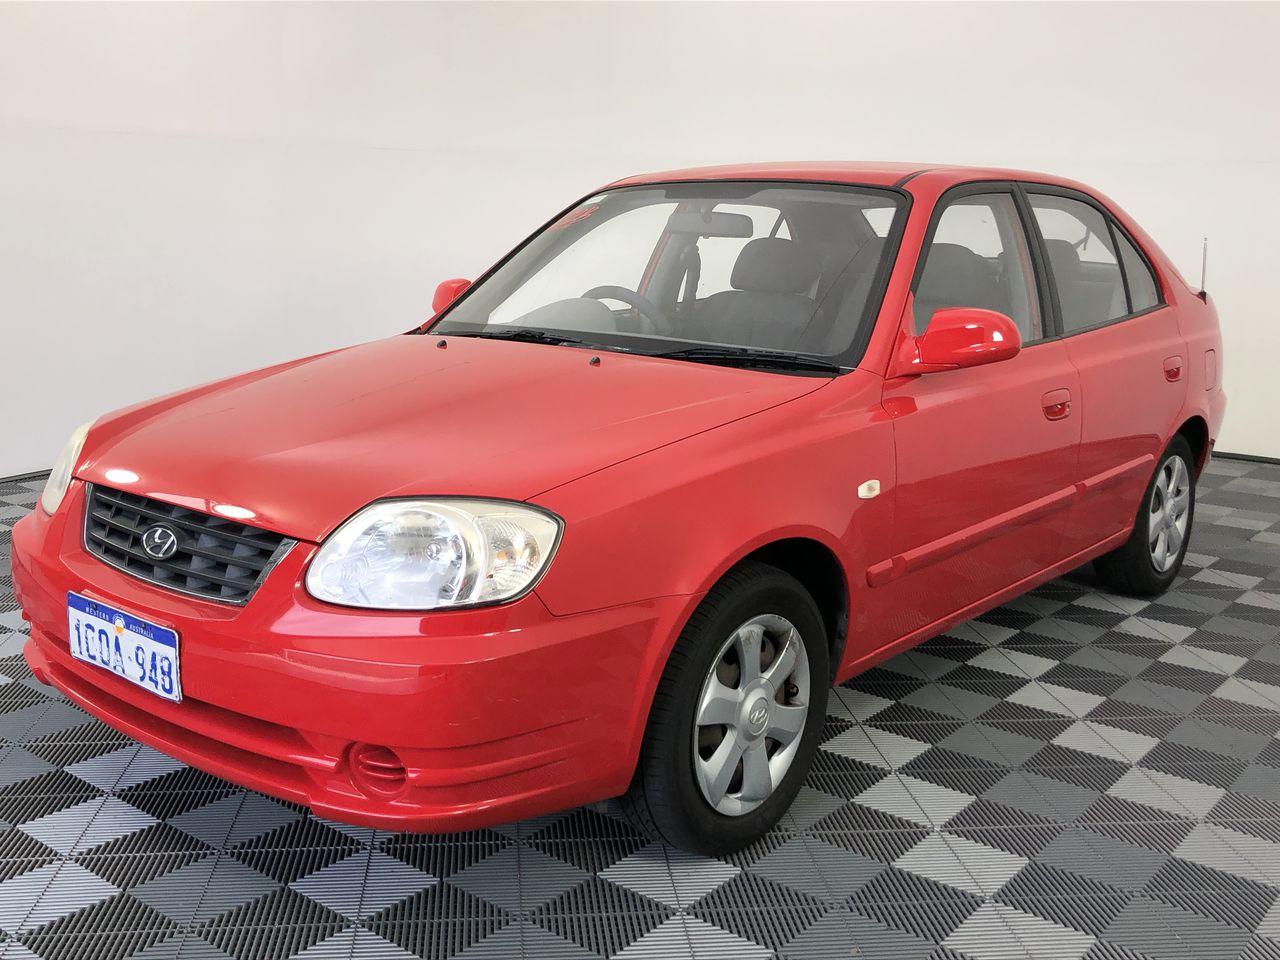 2005 Hyundai Accent 1.6 LS Automatic Hatchback